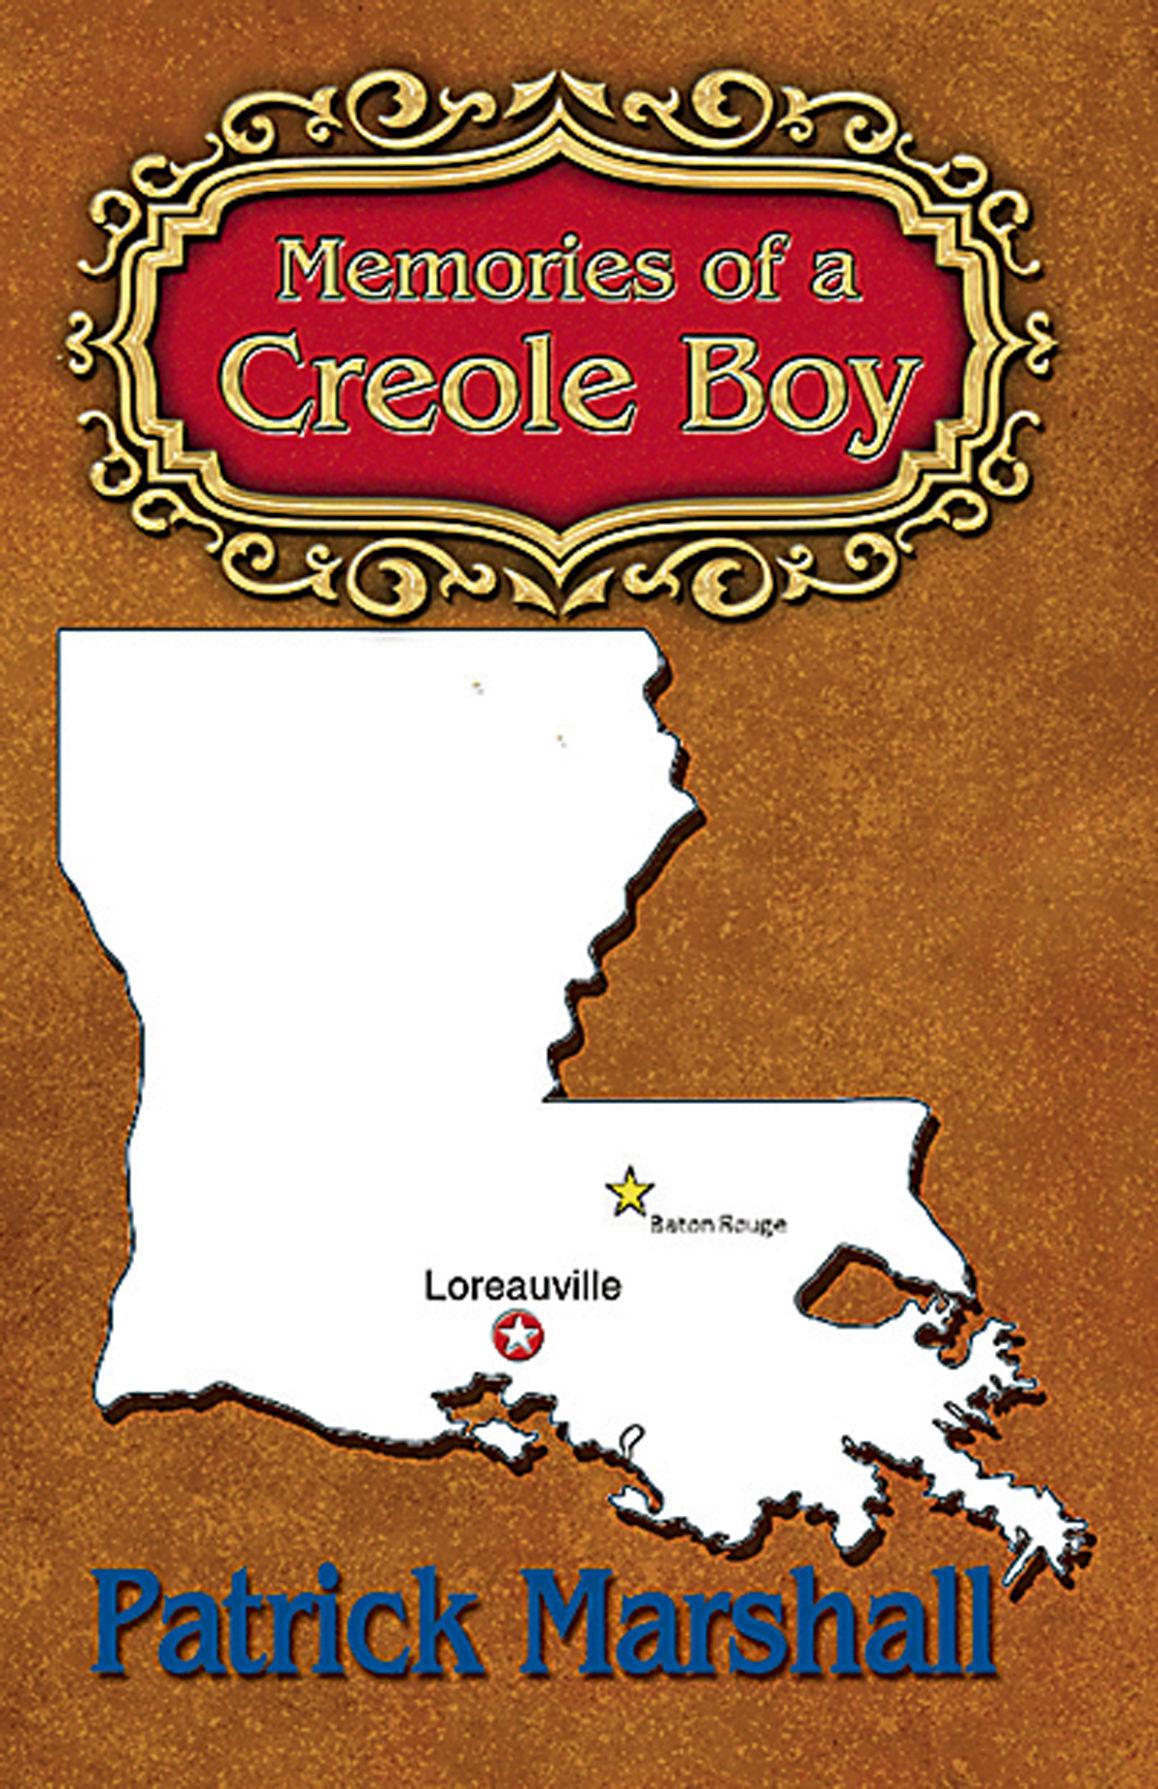 loreauville men Men's breakfast & bible studyfirstumcnicomfree - in google play view follow  us x a  (337) 369-3721 directions men's breakfast & bible study.